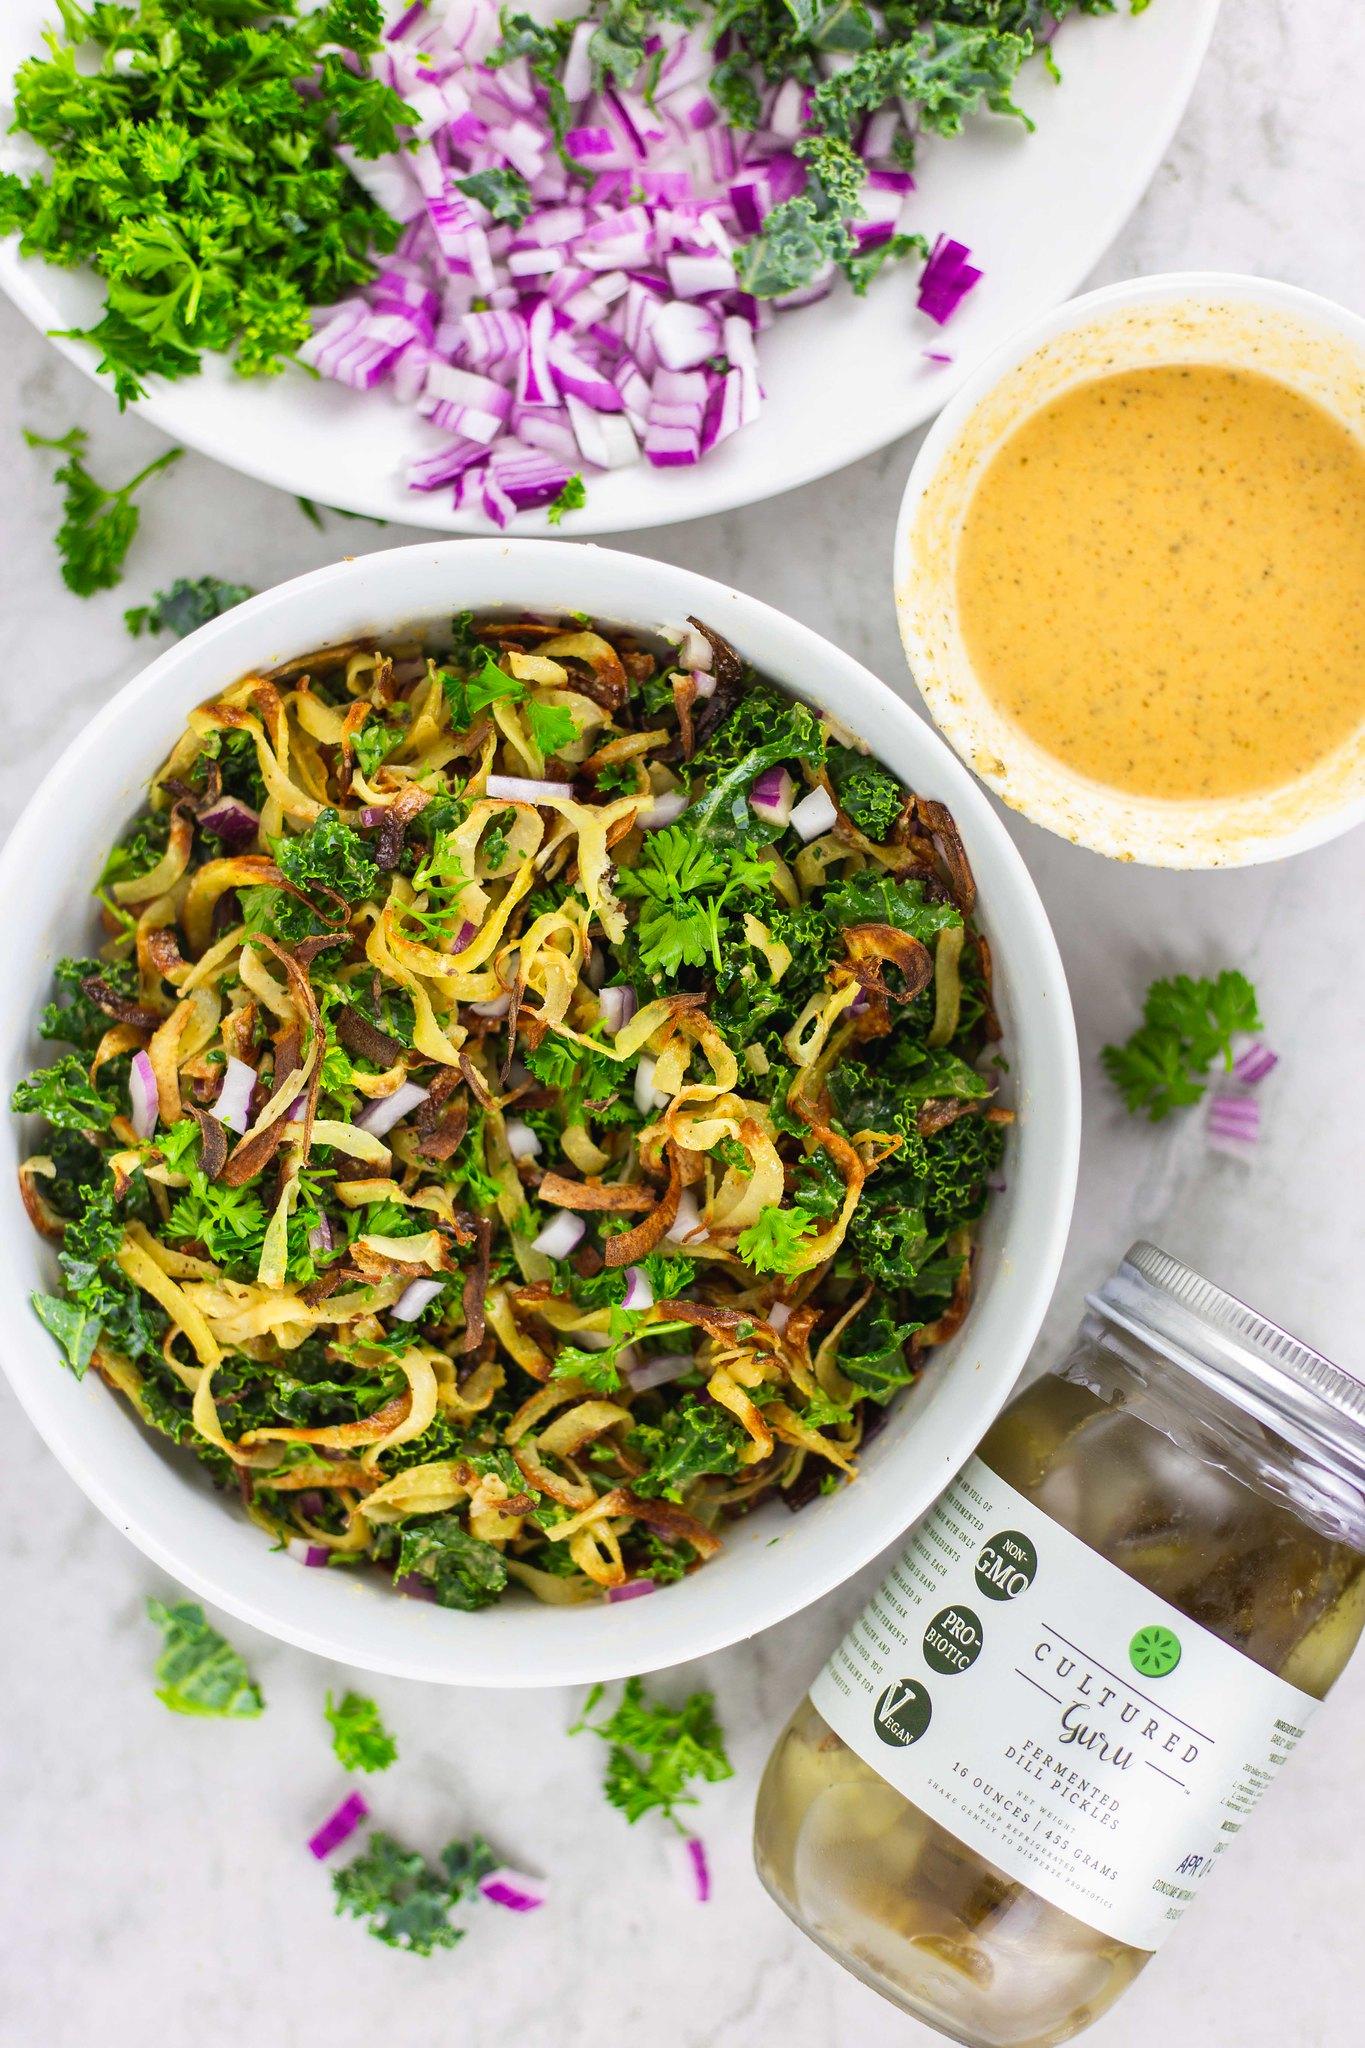 Vegan Healthy Potato Salad | Potato Salad Recipe with Fermented Dill Pickles